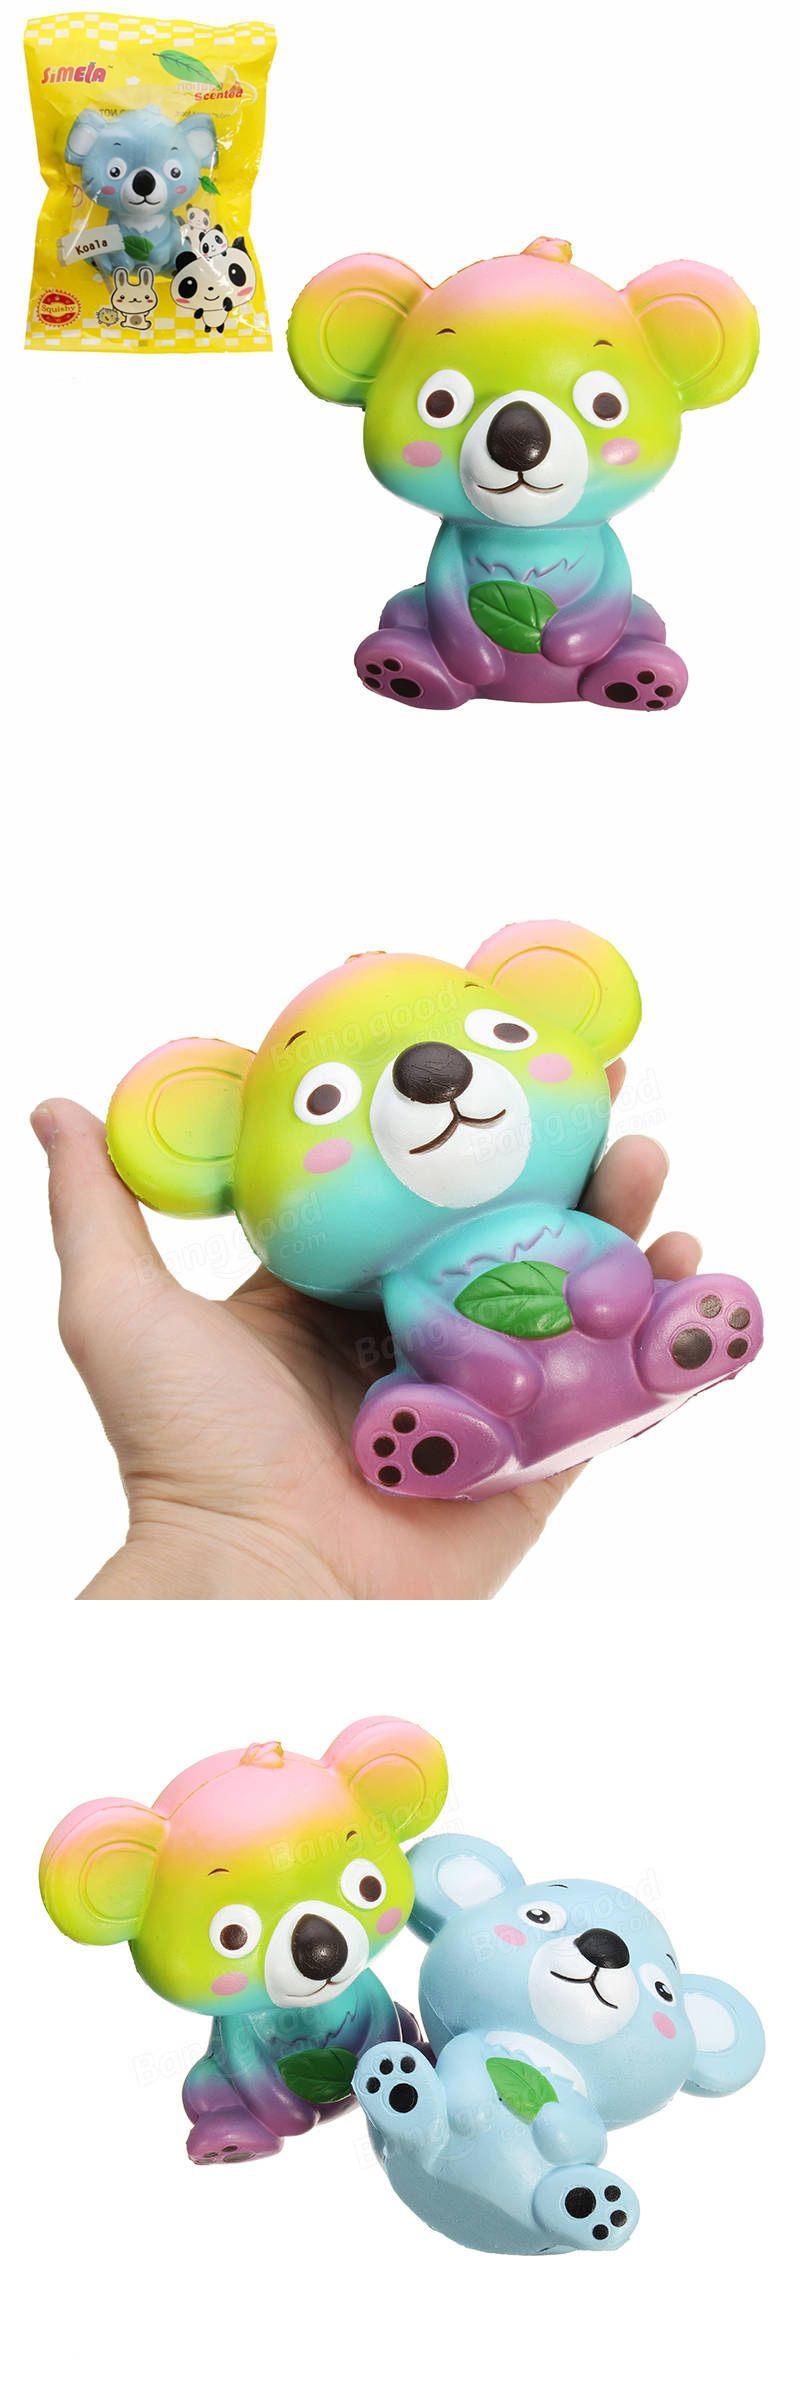 Simela Squishy Koala 12cm Bear Collection Gift Slow Rising